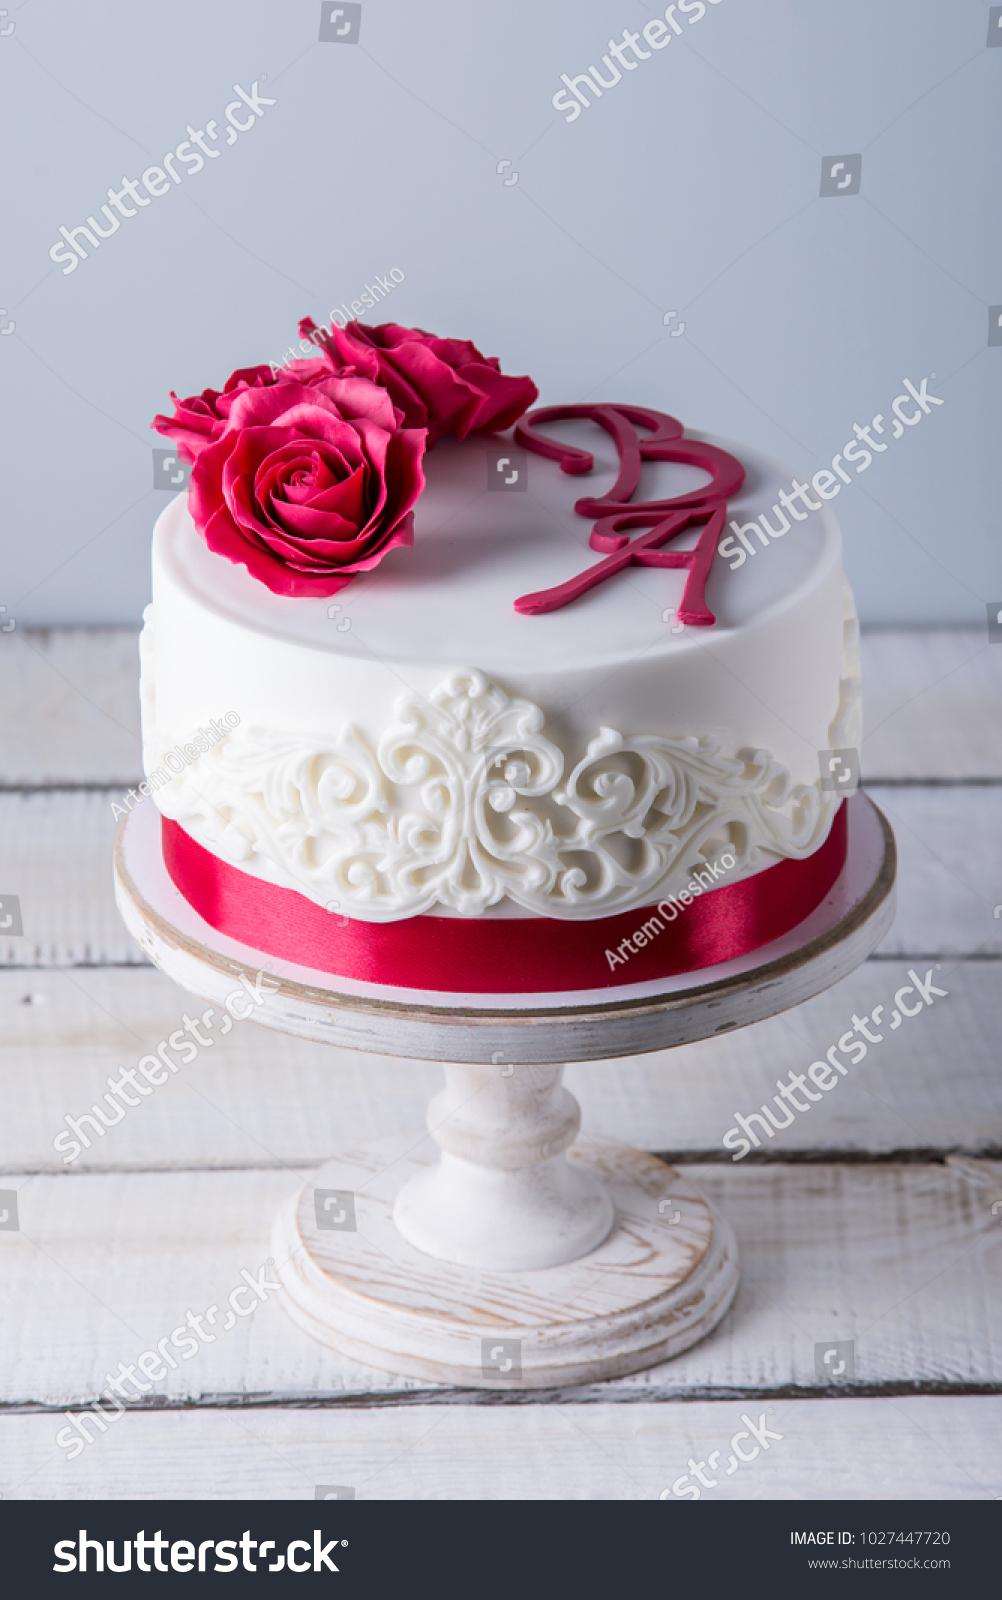 Delicious White Wedding Cake Decorated Flowers Ez Canvas